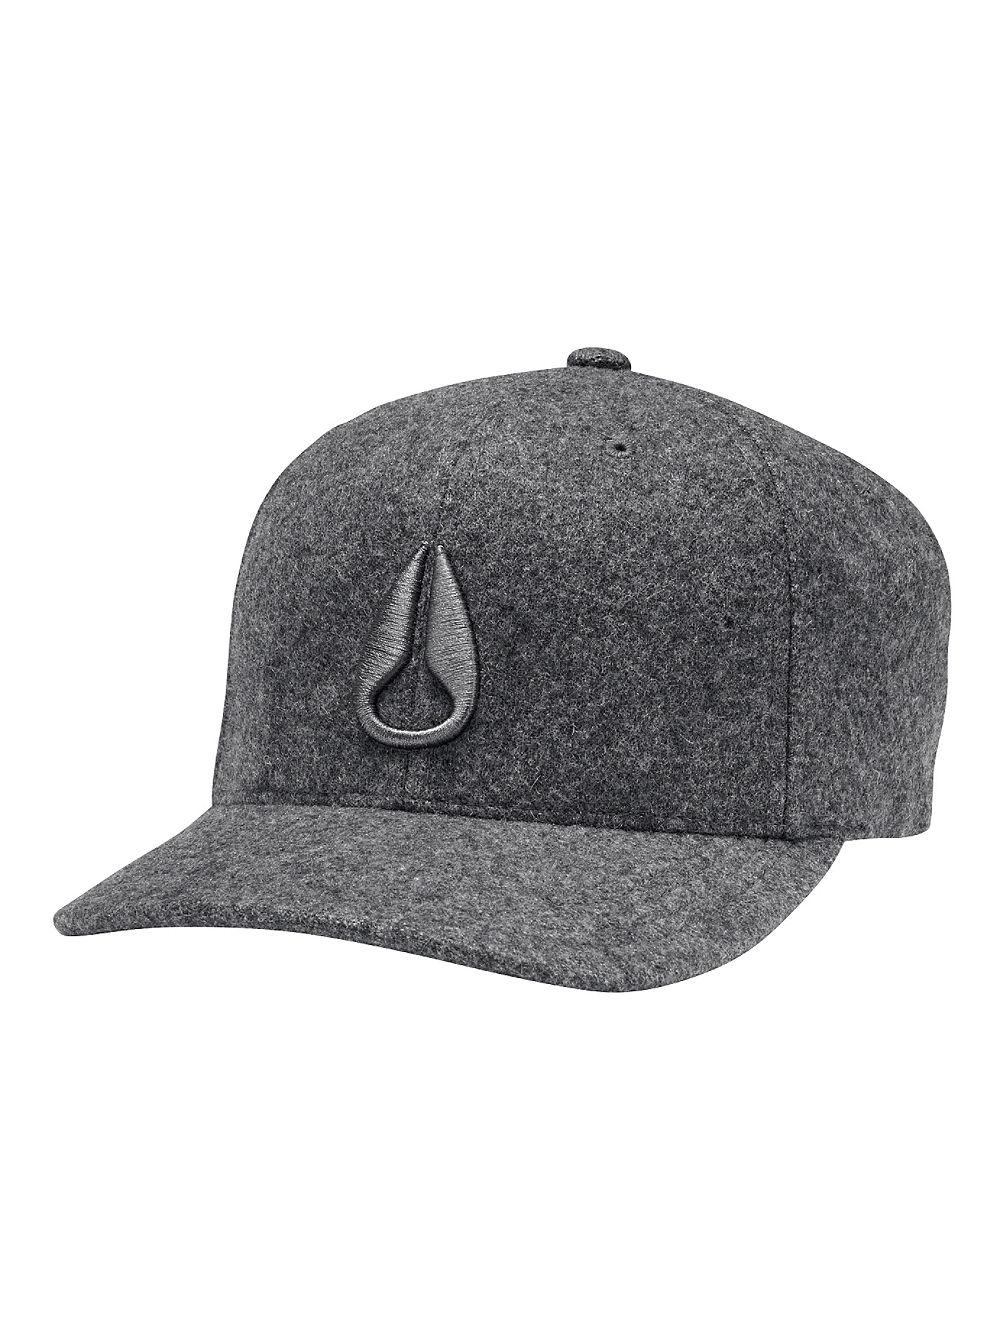 online retailer 55f94 08814 Nixon Deep Down Athletic Textured Cap